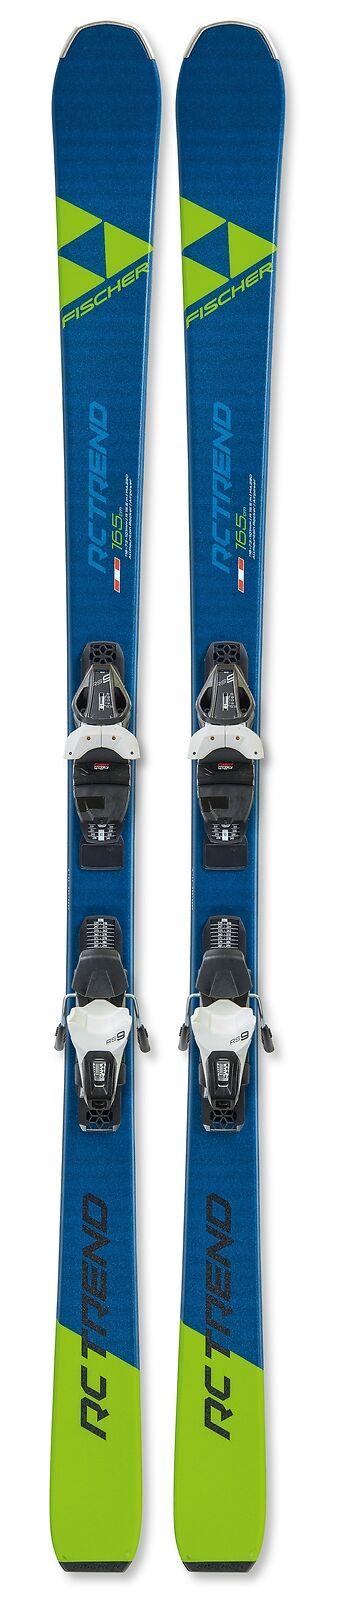 Fischer RC TREND SLR PRO (2019 20) + RS9 SLR - Allroundski (A30119)